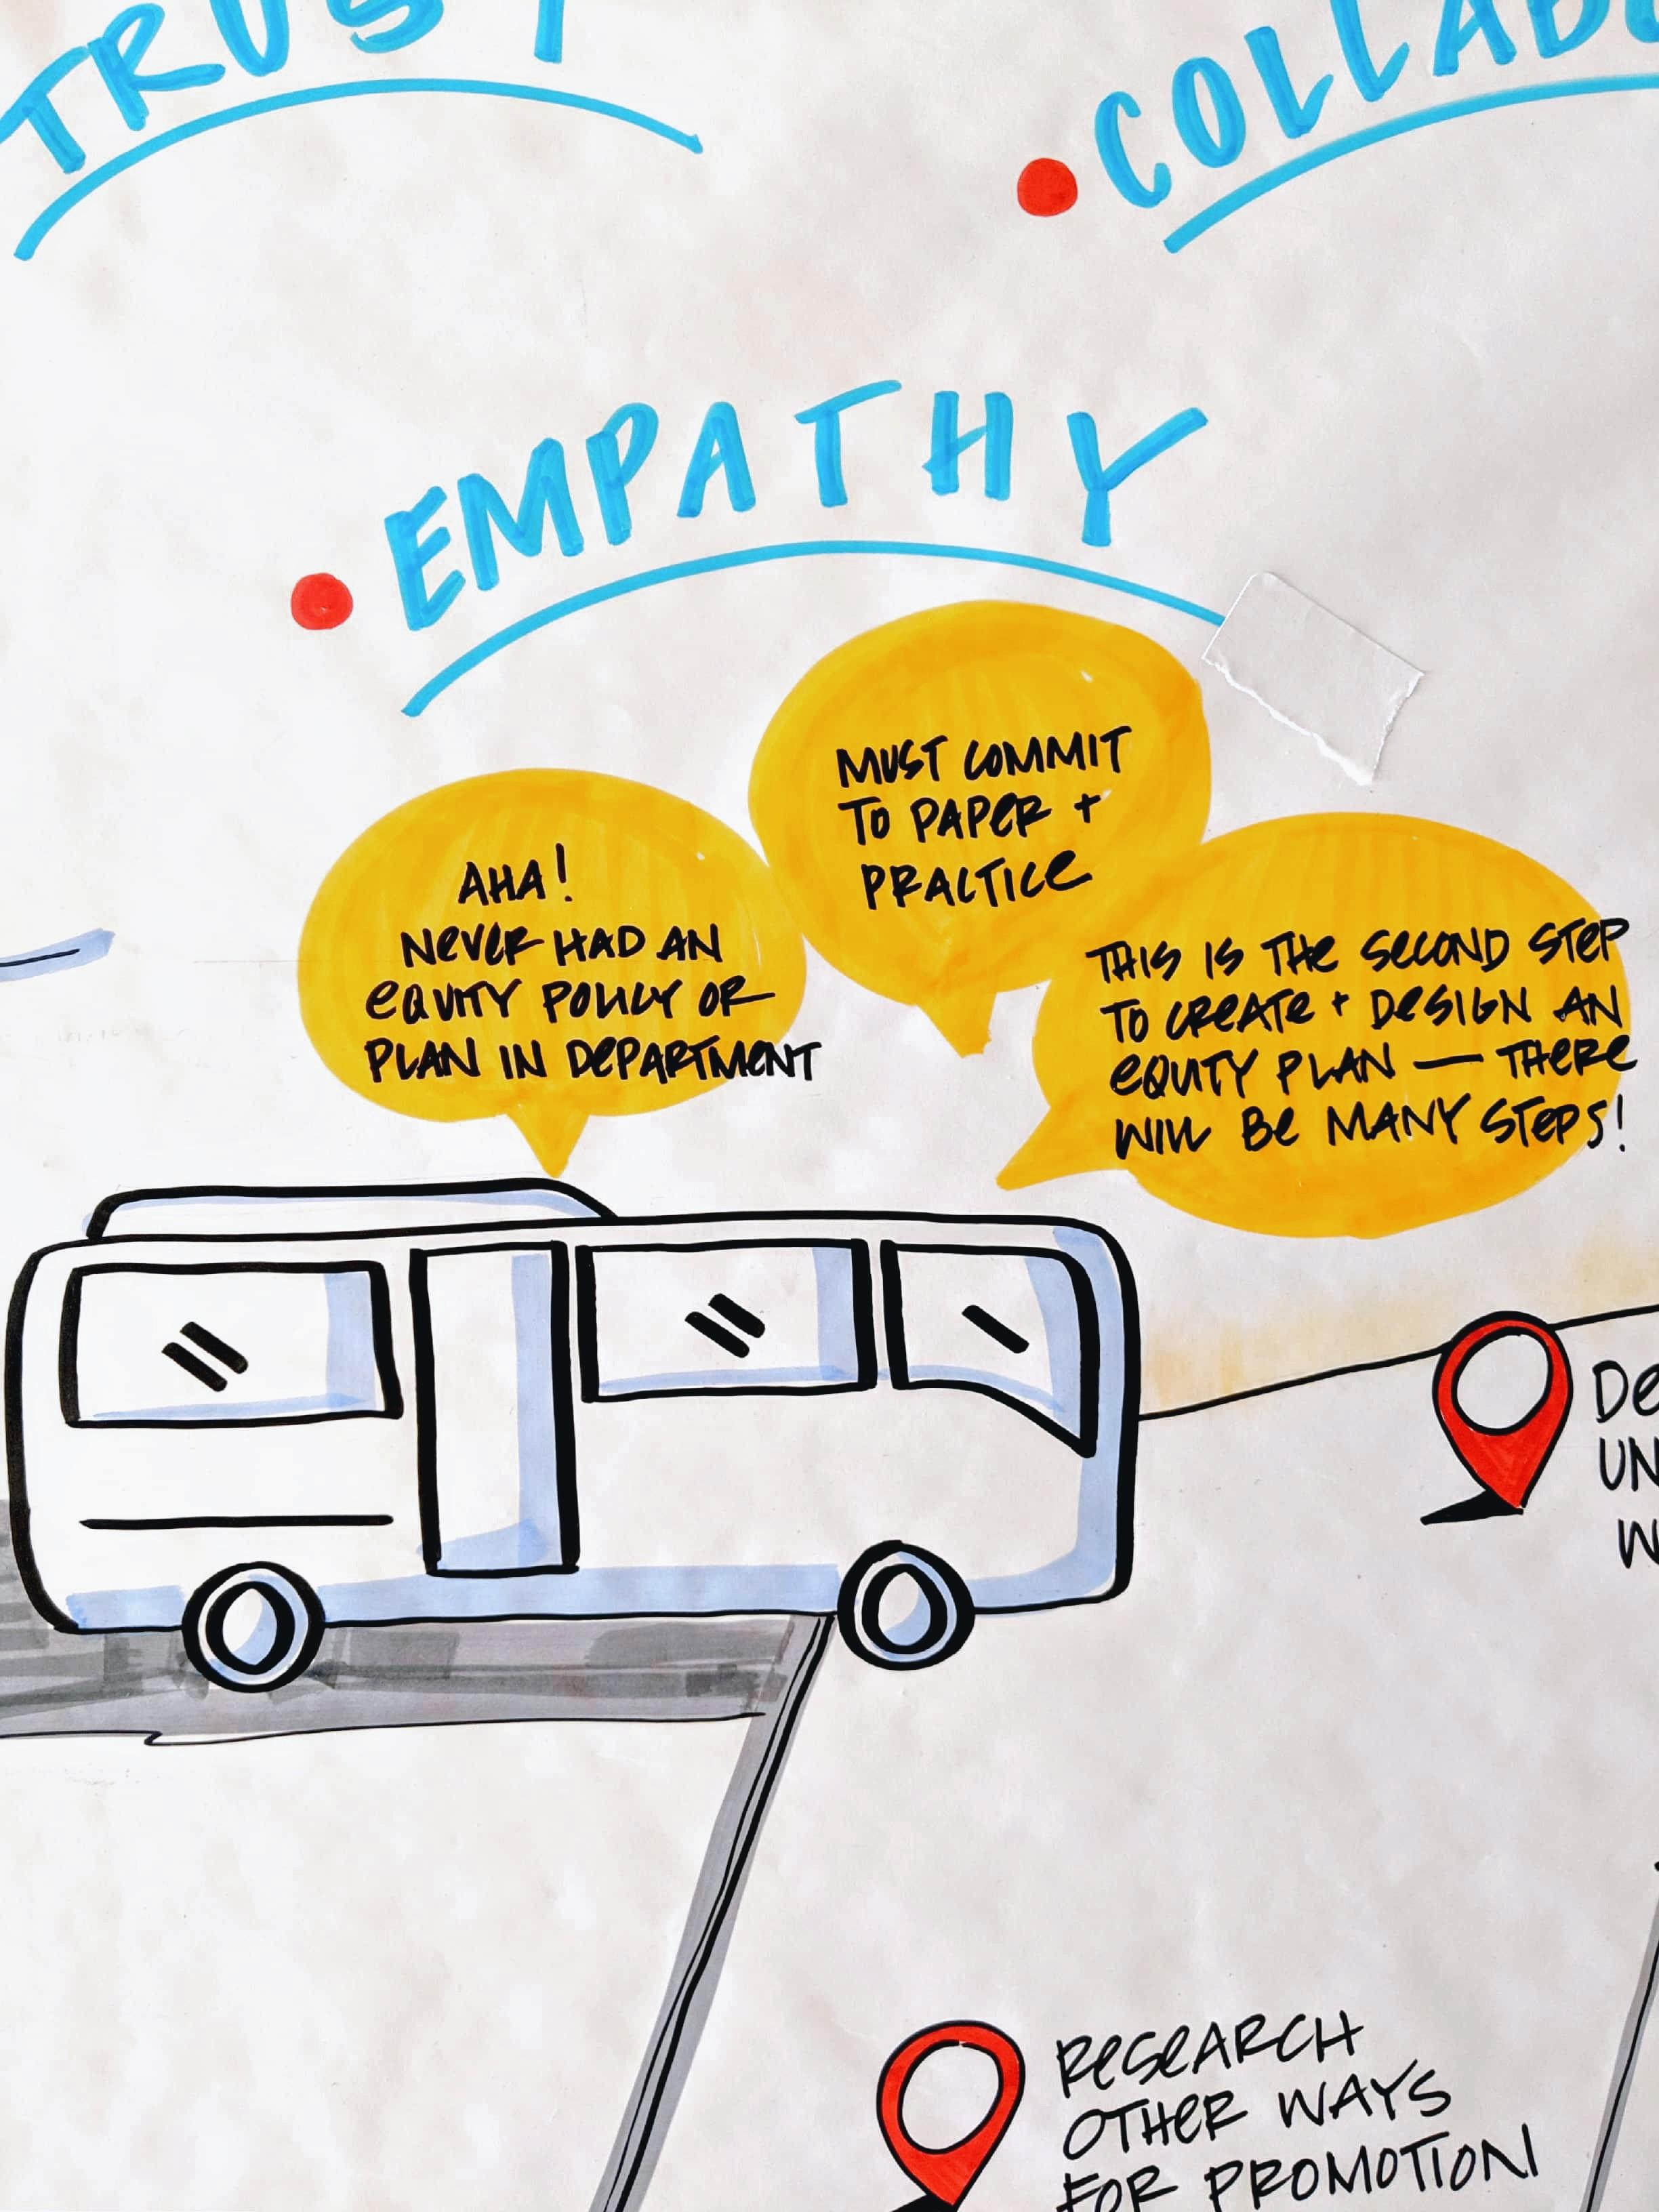 ACPHD_20190423_Chart 2 Roadmap_Snippet Bus Ongoing Journey.jpg